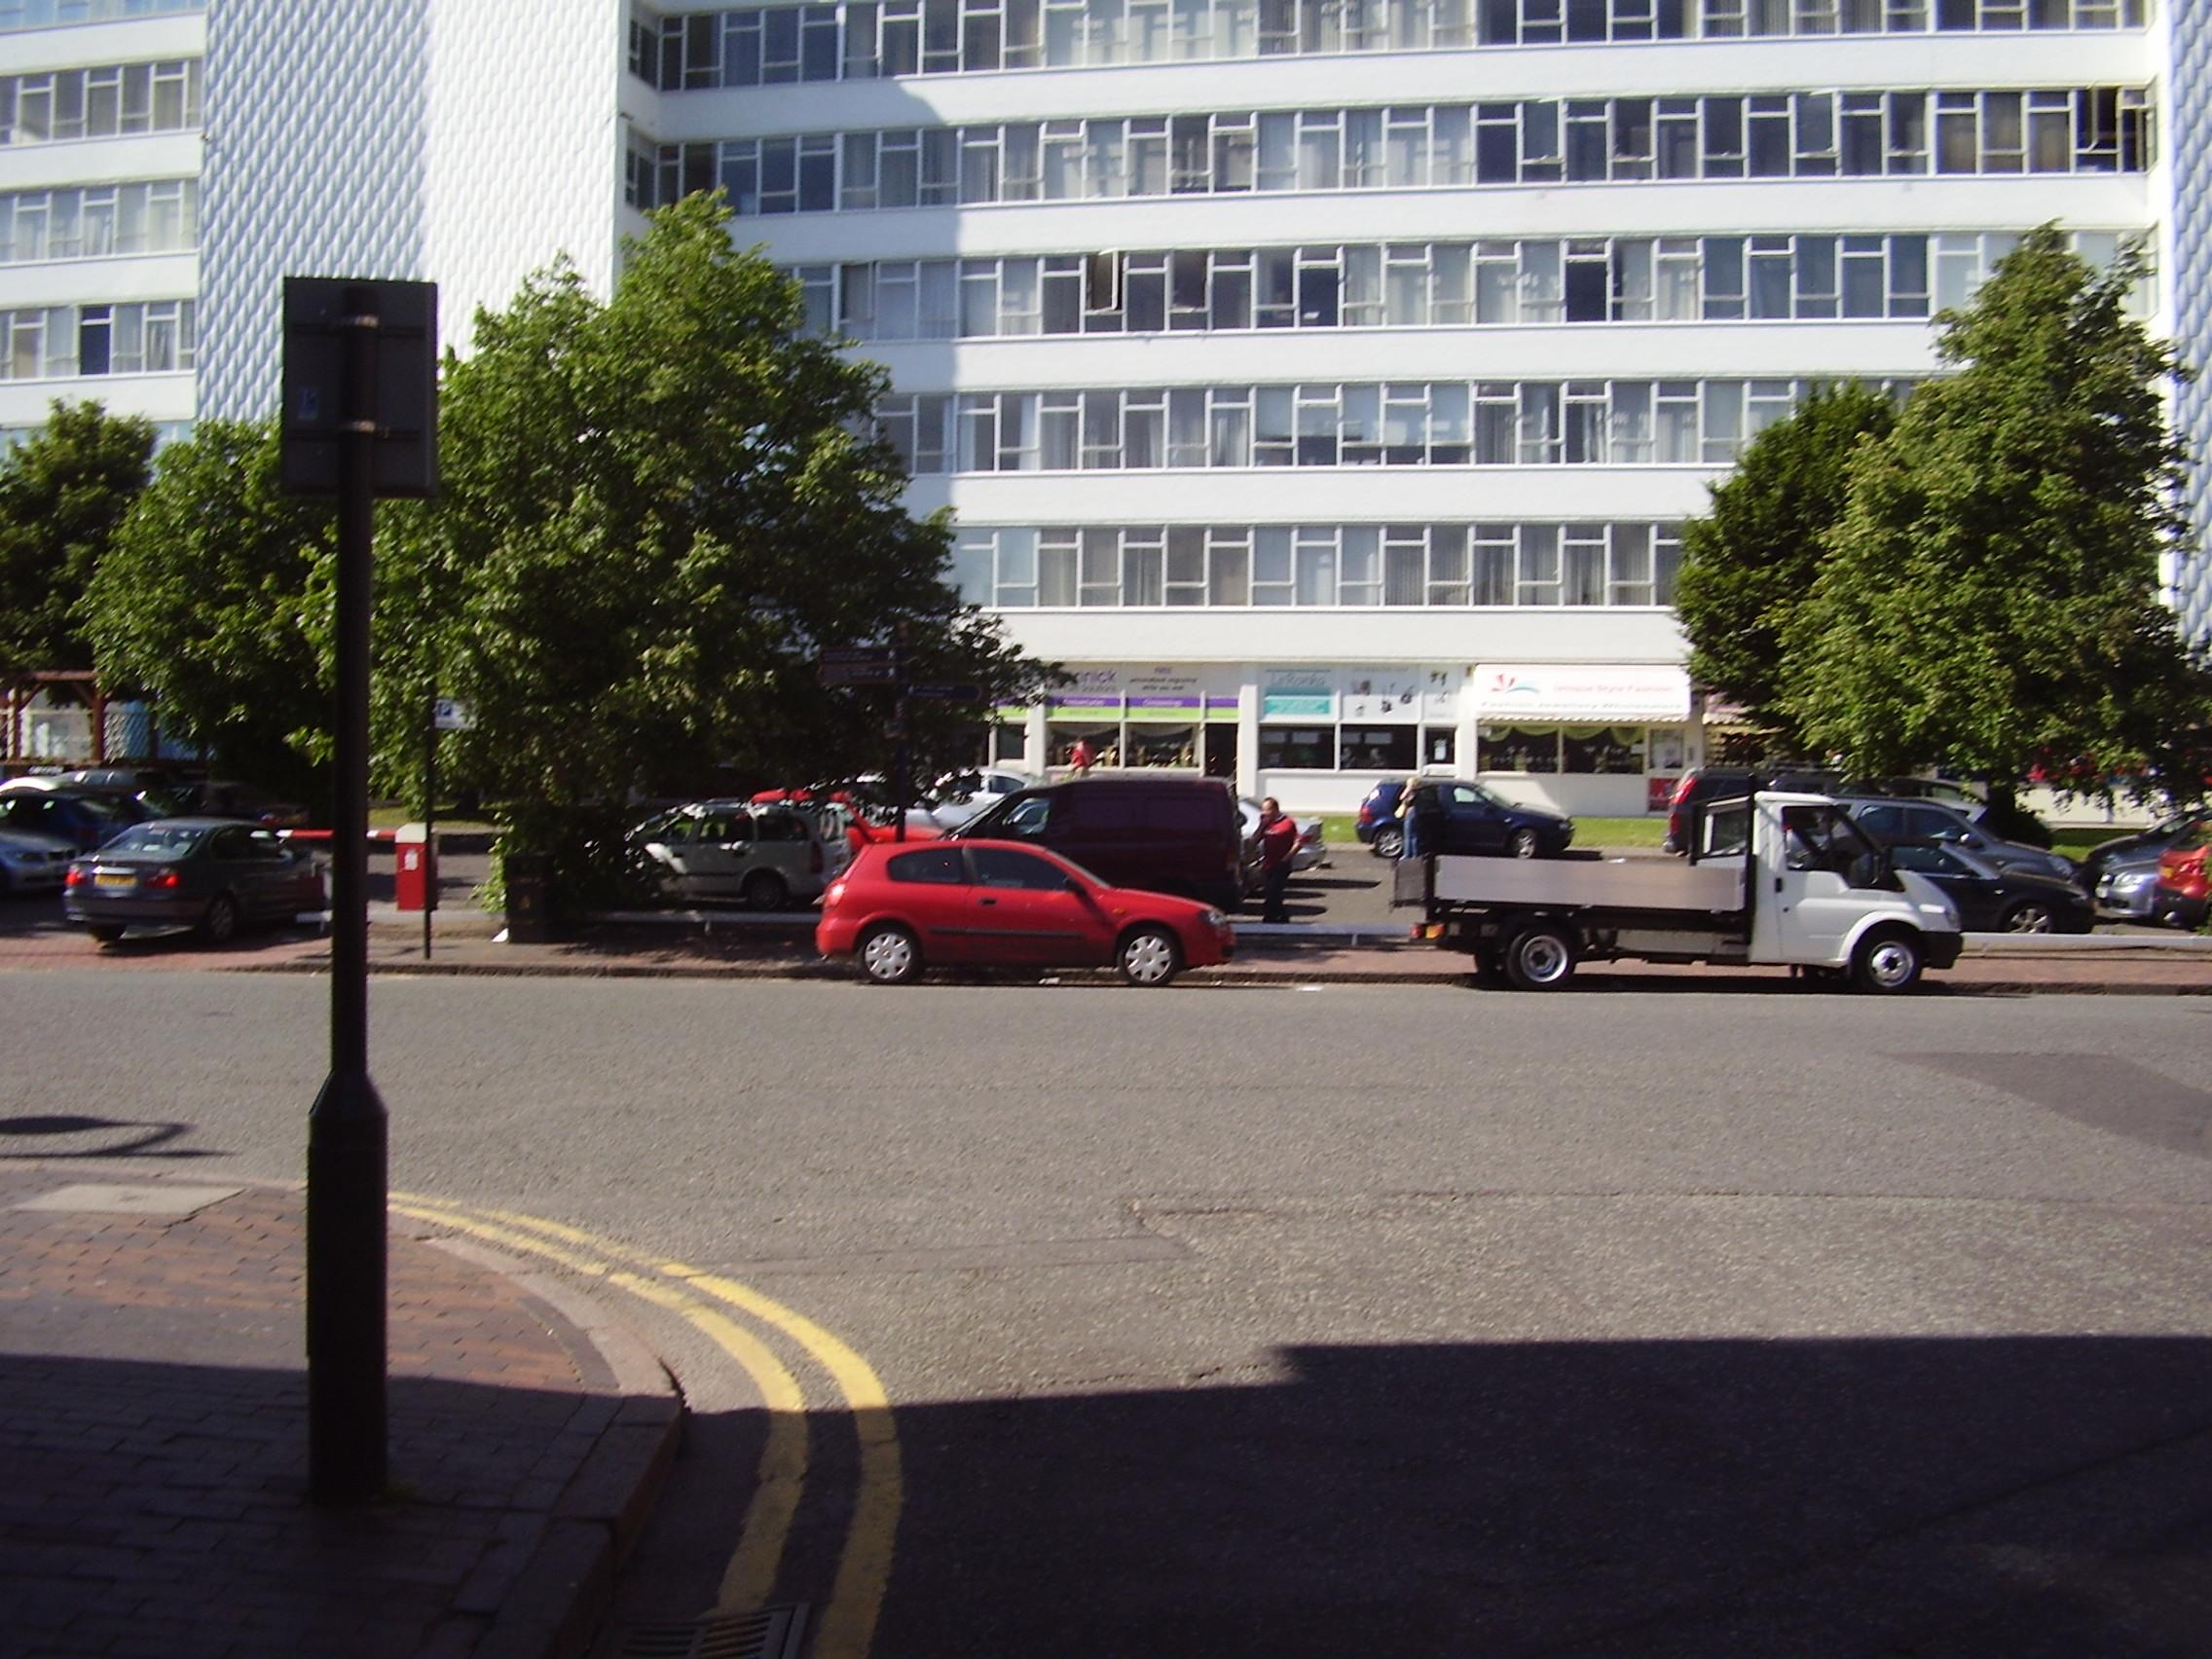 2008 Street view of the Jewellery Quarter in Birmingham 3